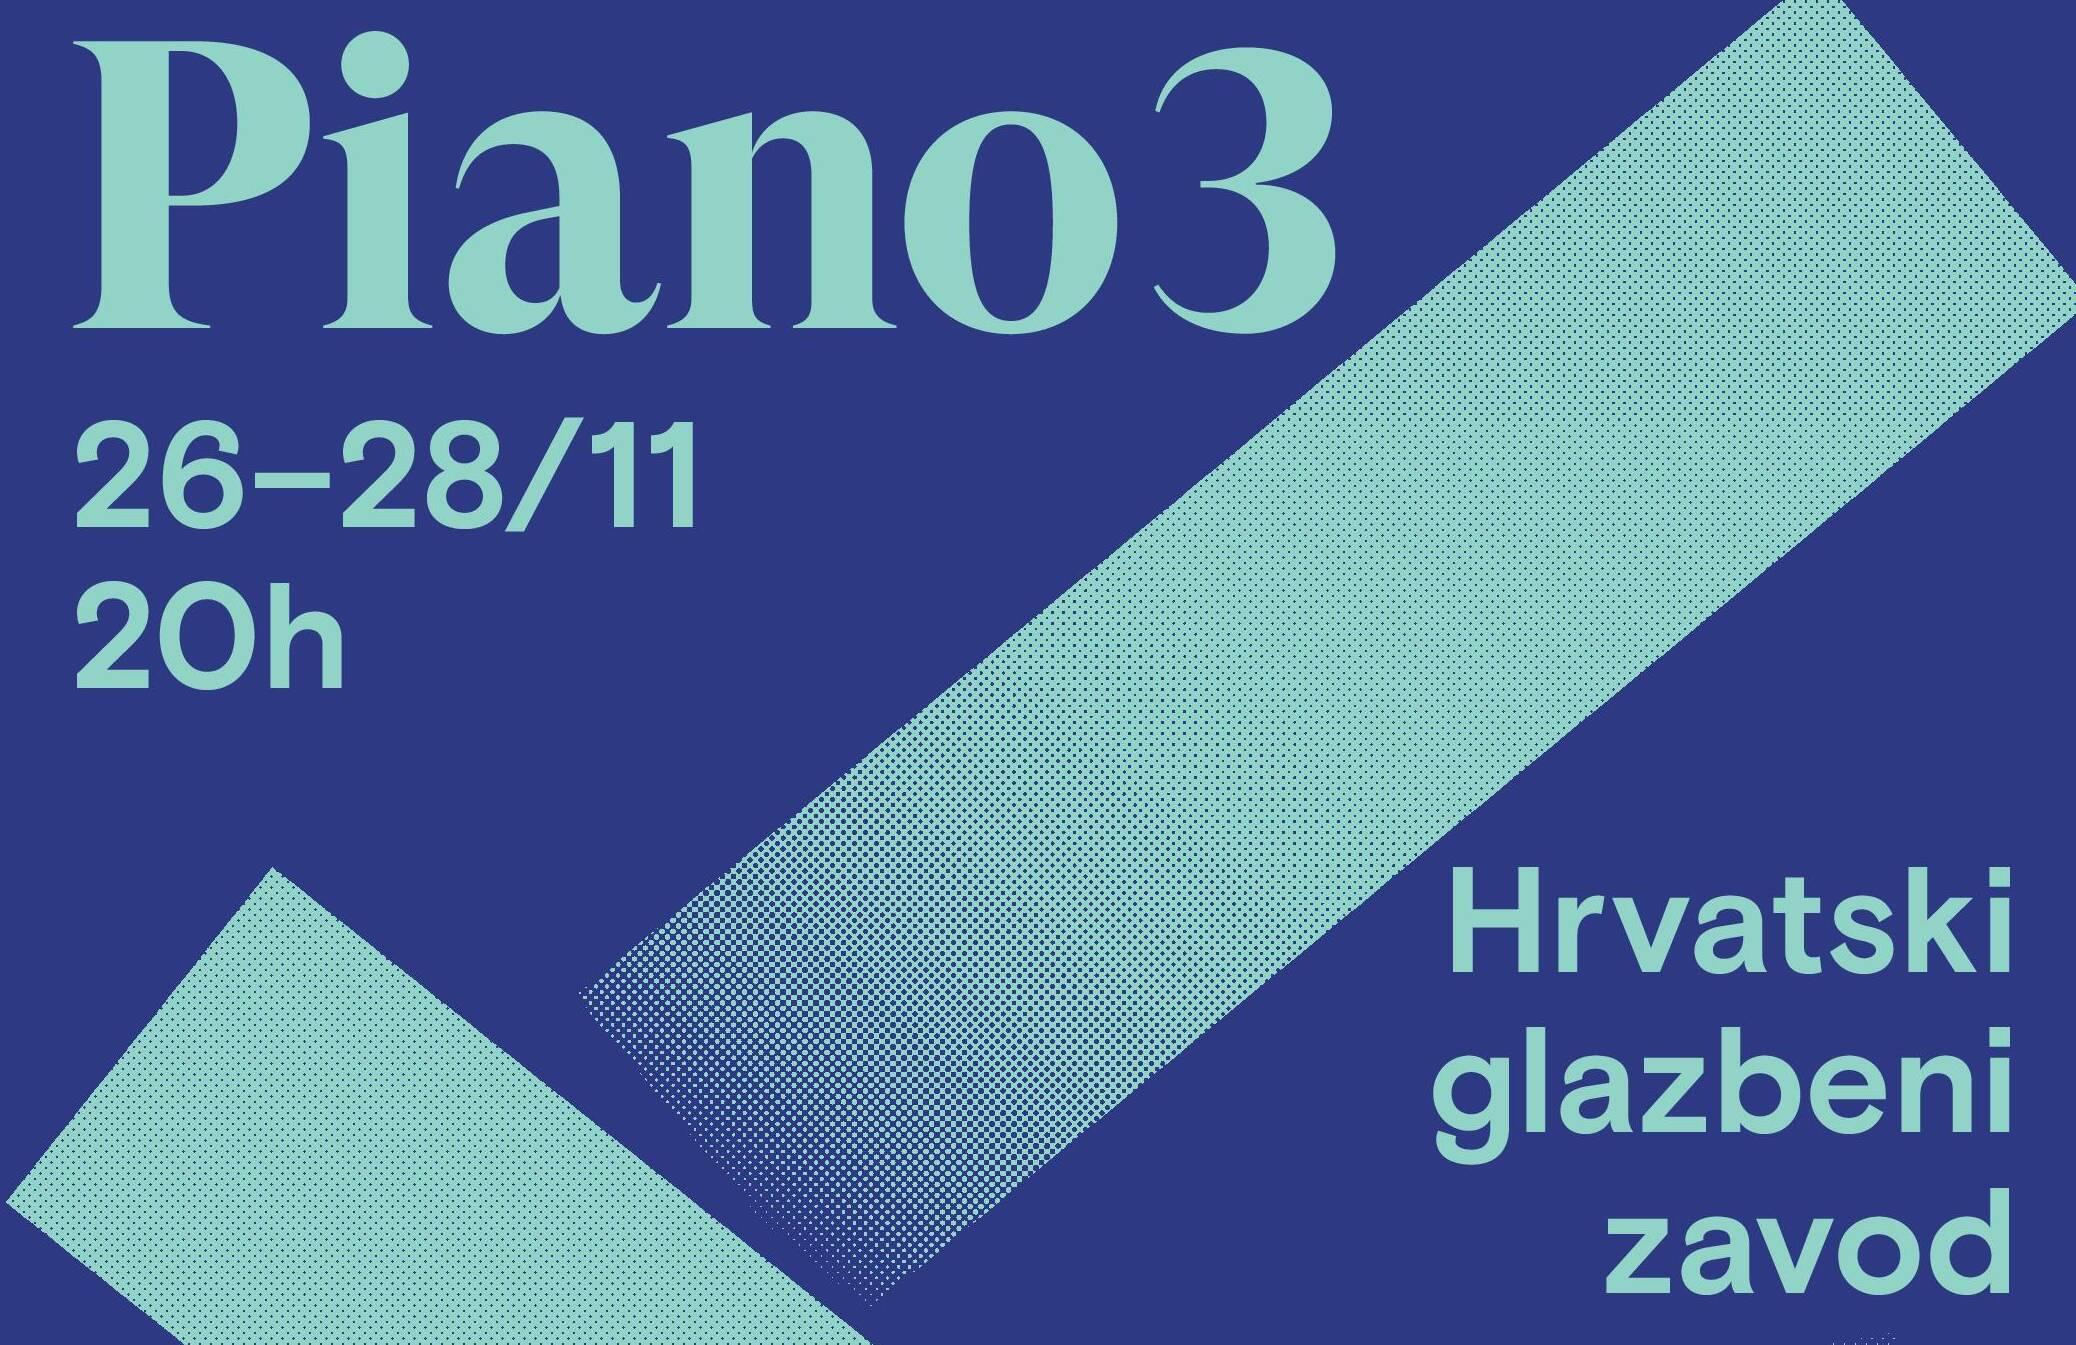 Glazbeni festival Piano3 u HGZ-u